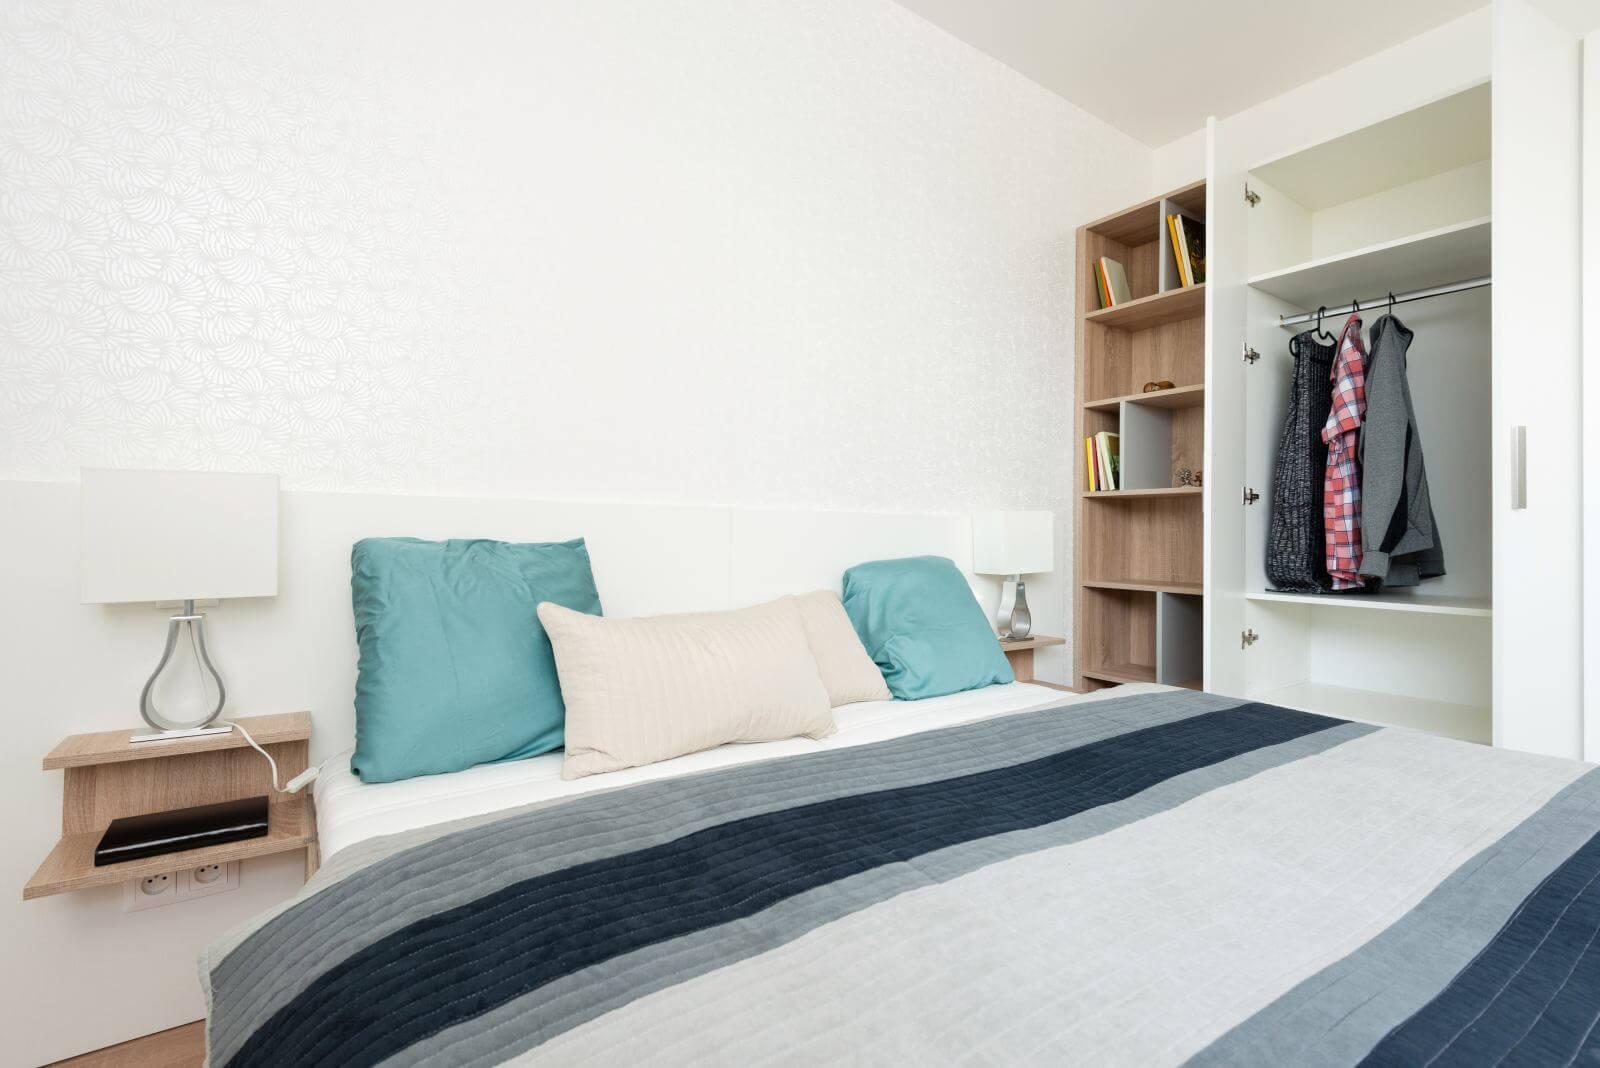 Contemporary bedroom interior of house